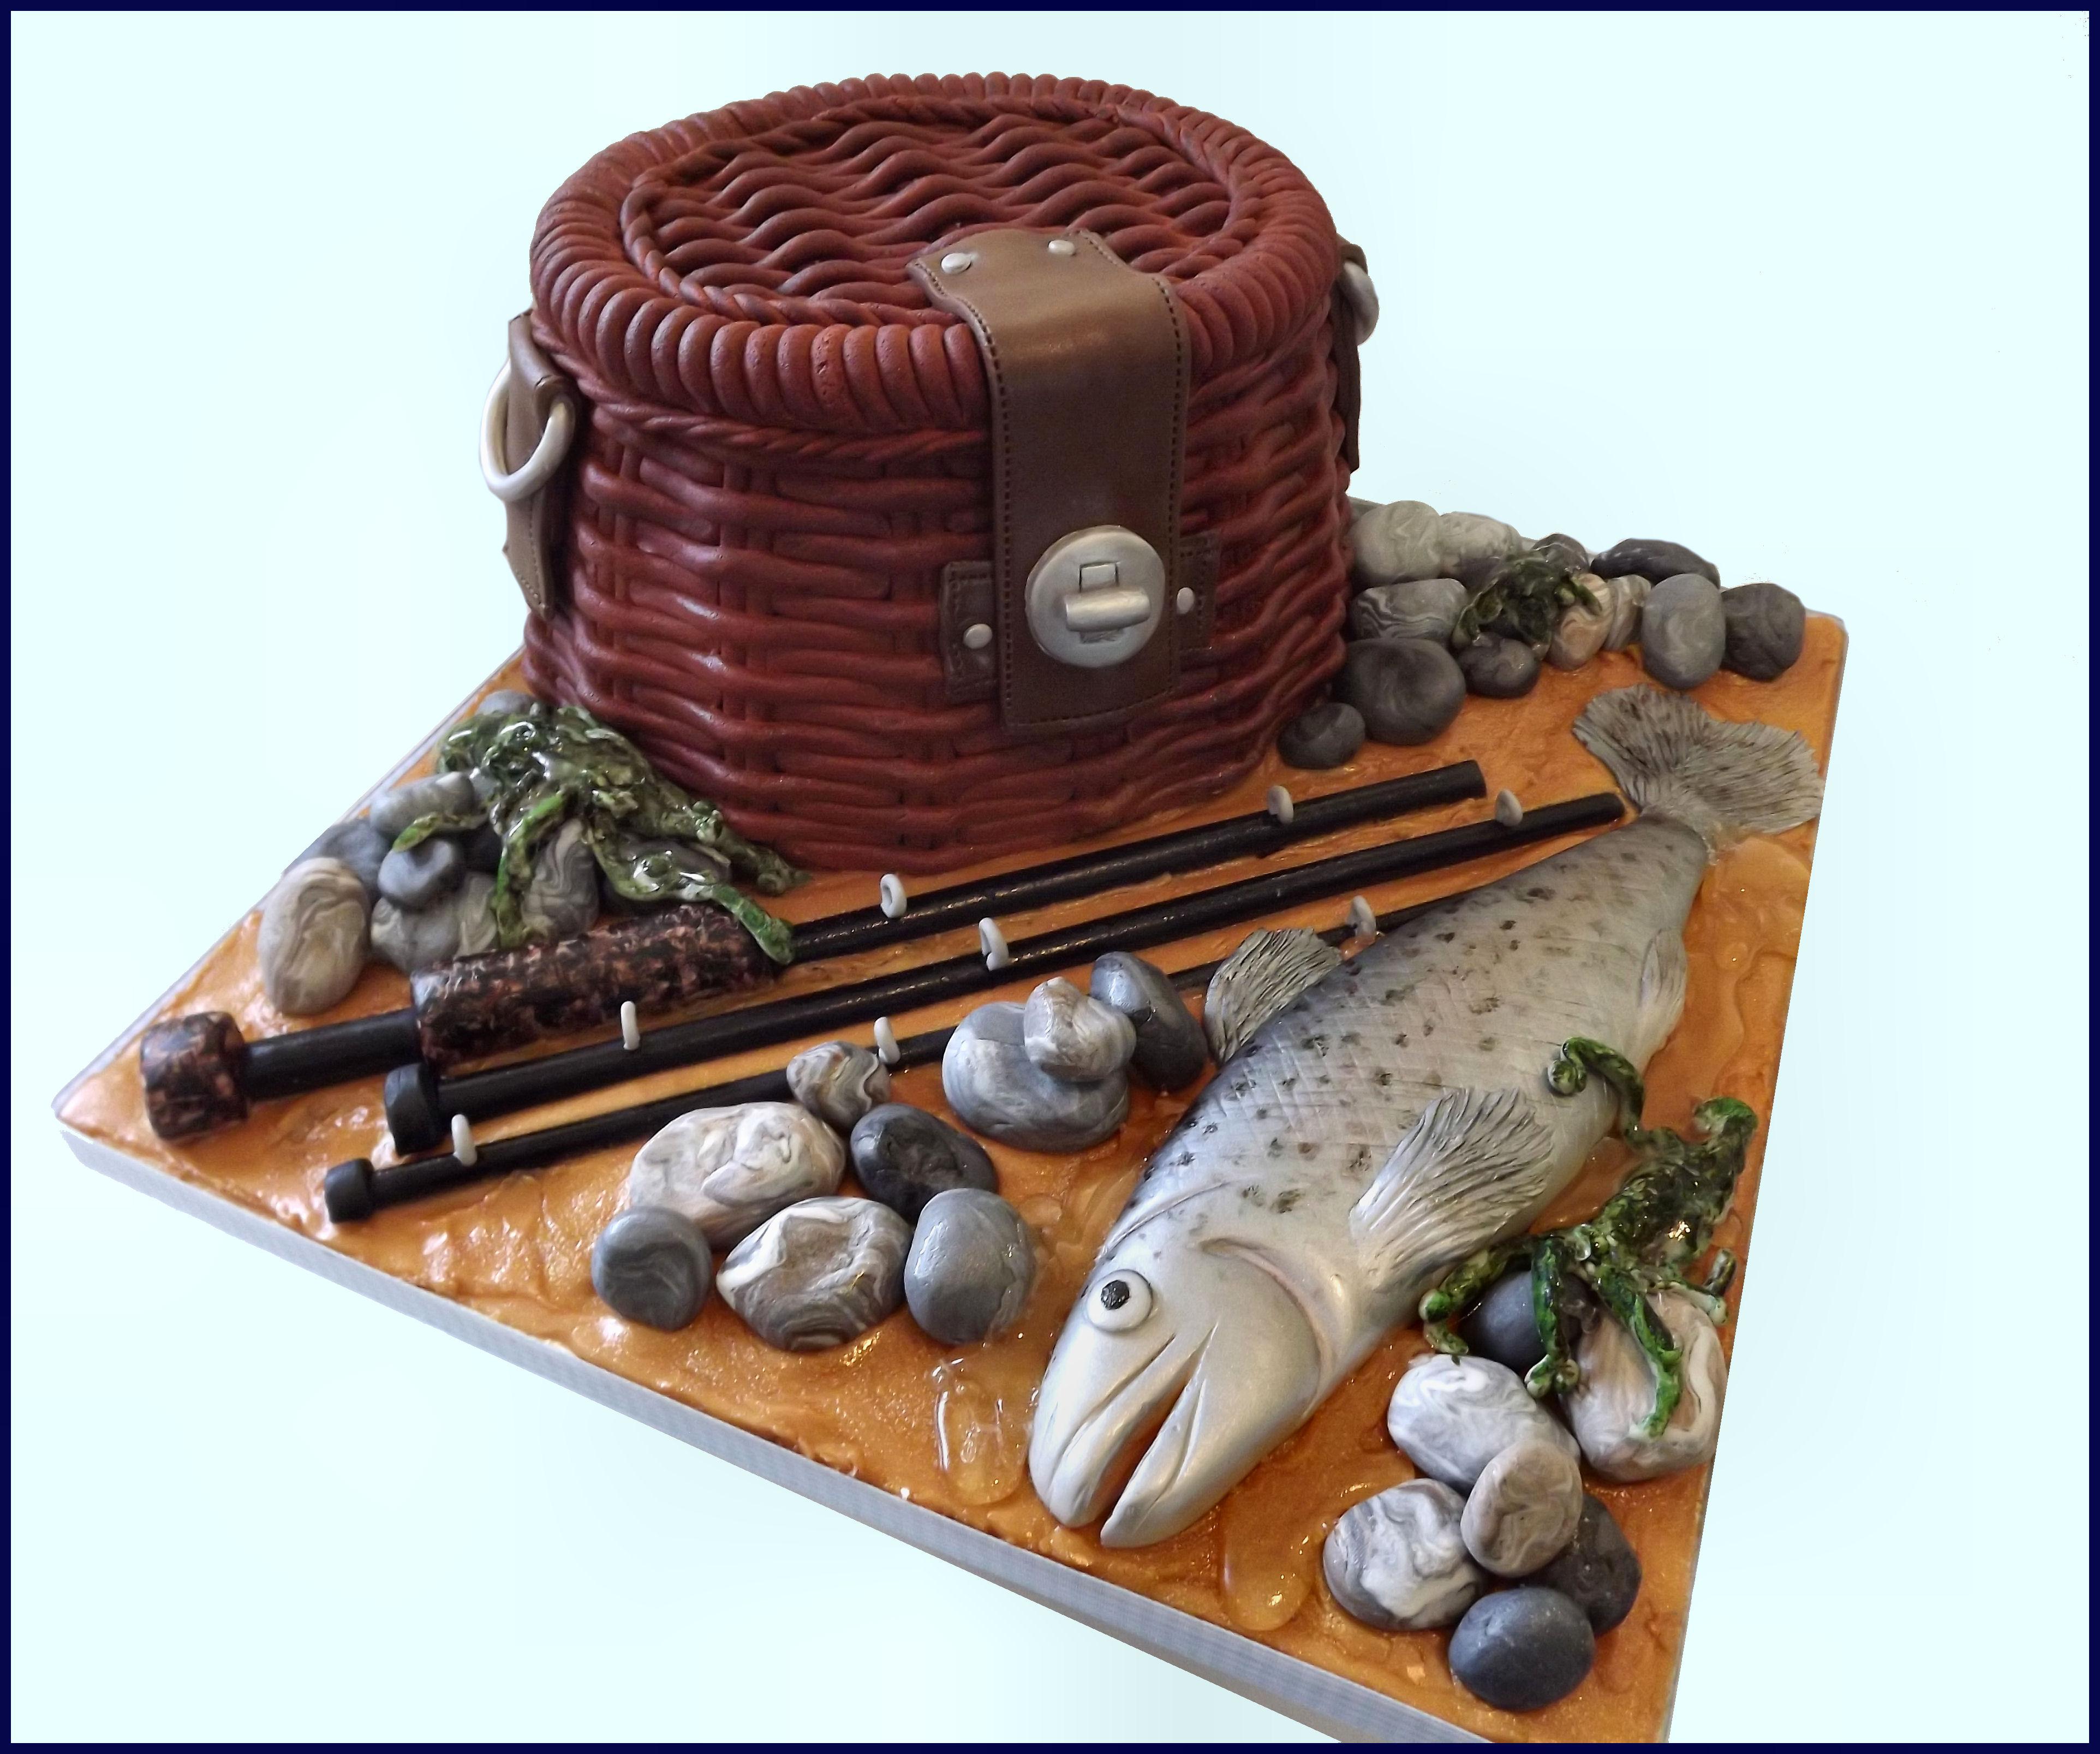 fishermans birthday cake